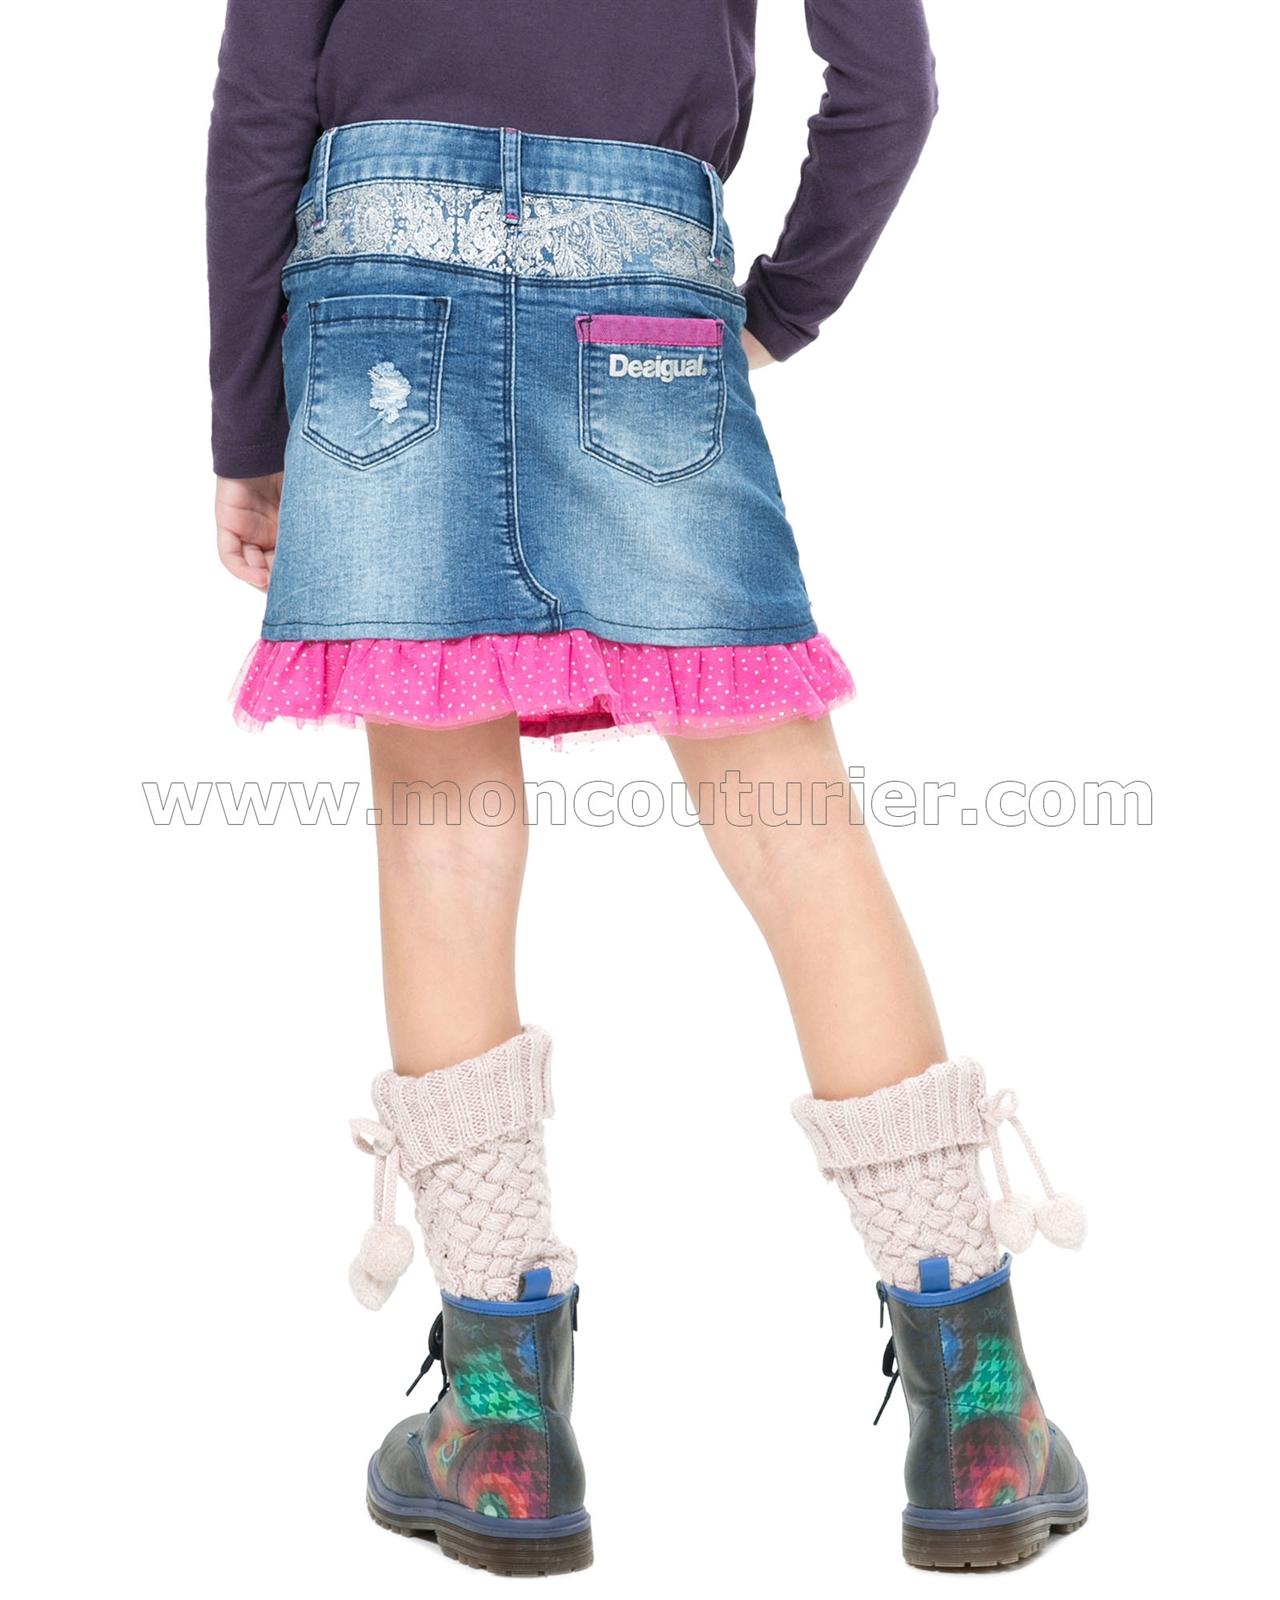 b413352d0 DESIGUAL Girls' Denim Skirt Gargalla, Sizes 5-14